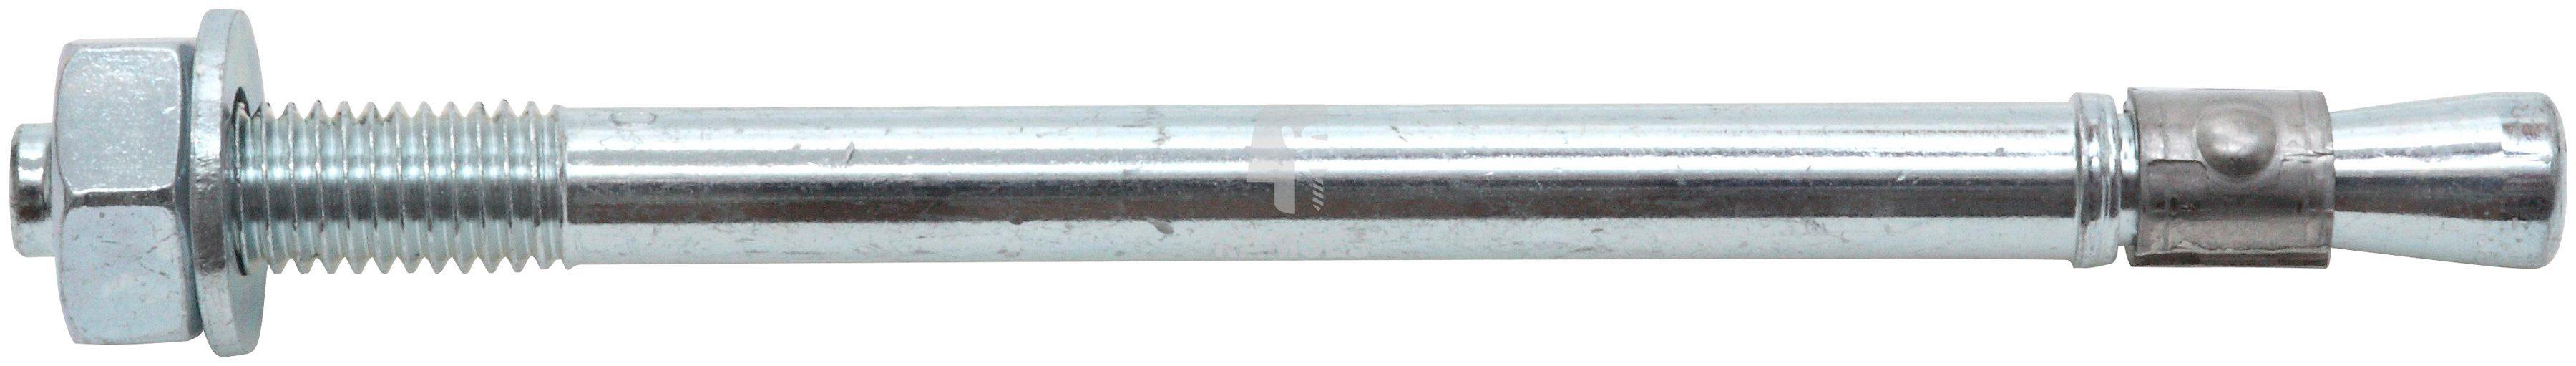 RAMSES Dübel , Bolzenanker B M12 x 180 mm, 10 Stück